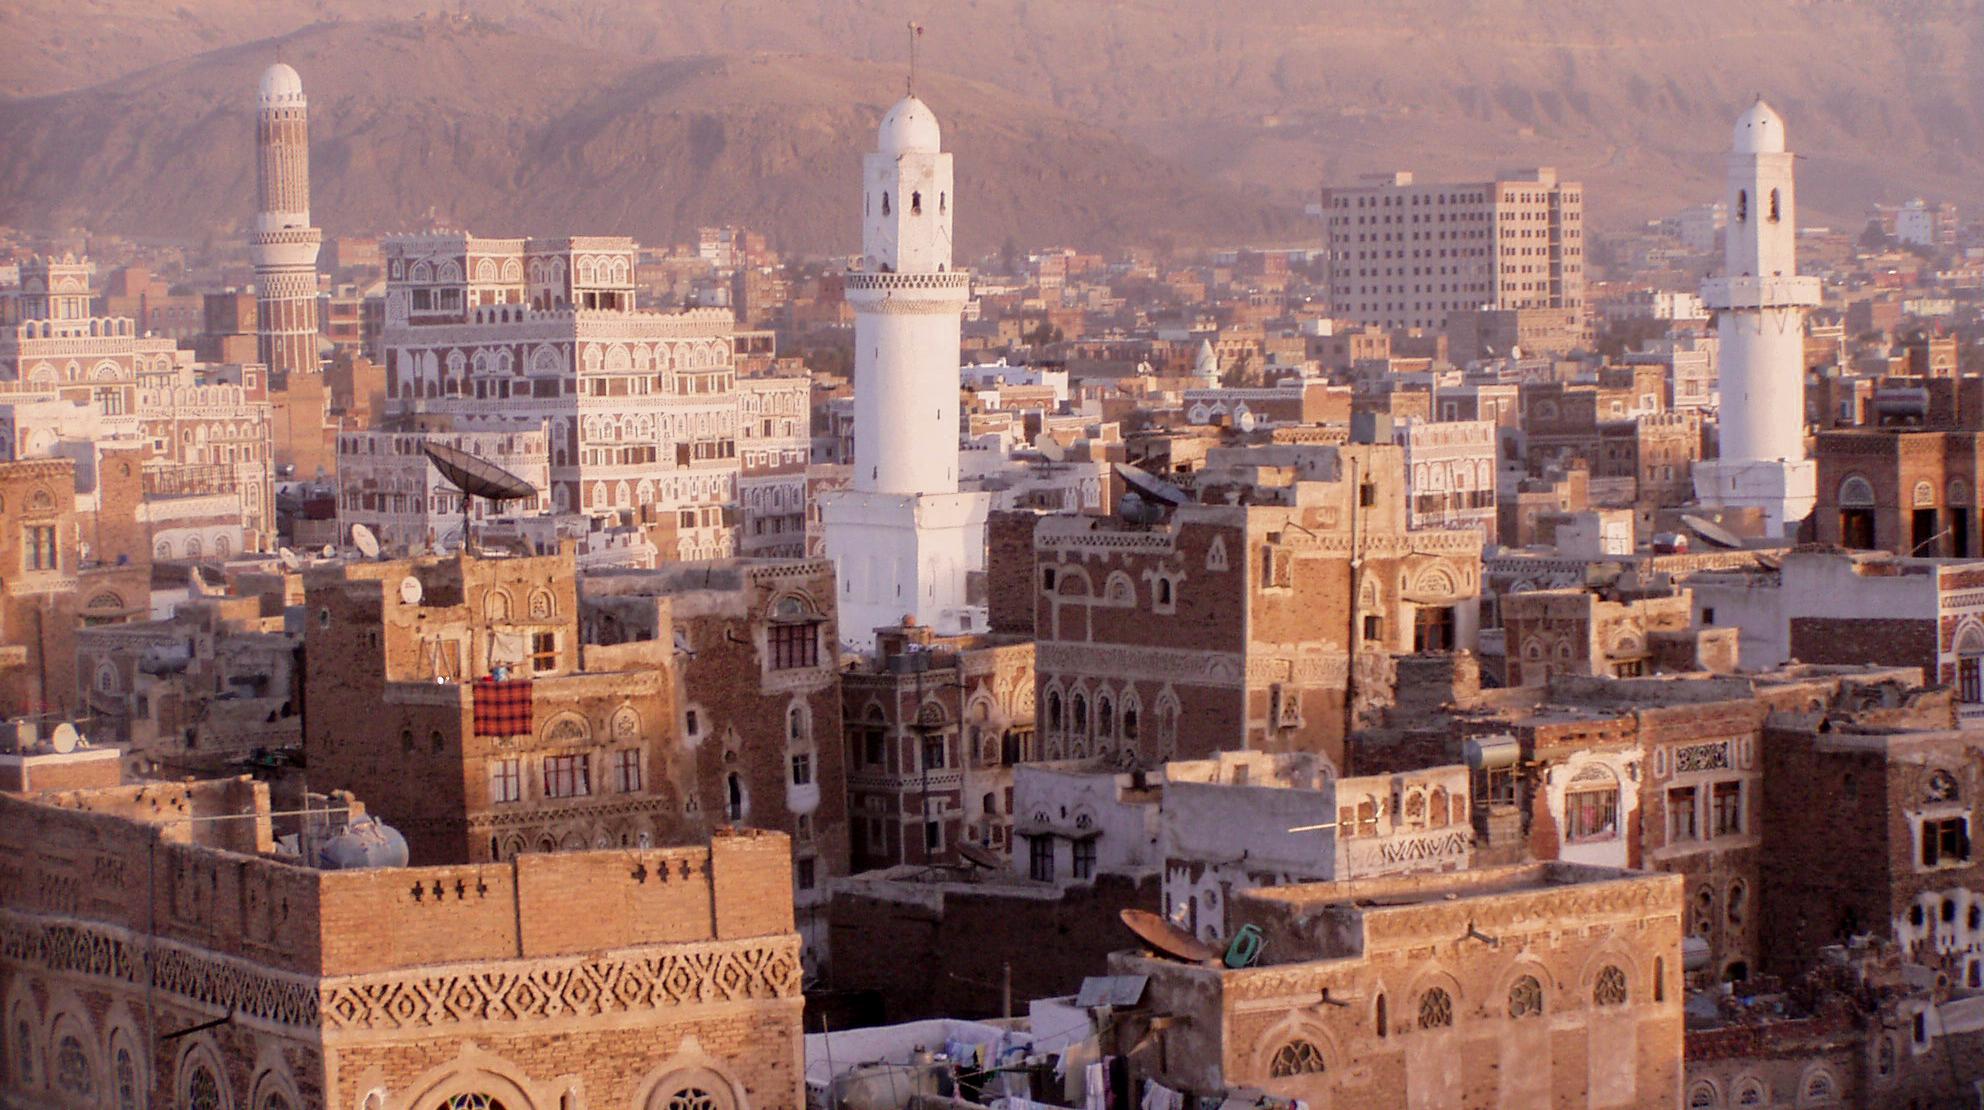 Sana'a, Yemen's largest city